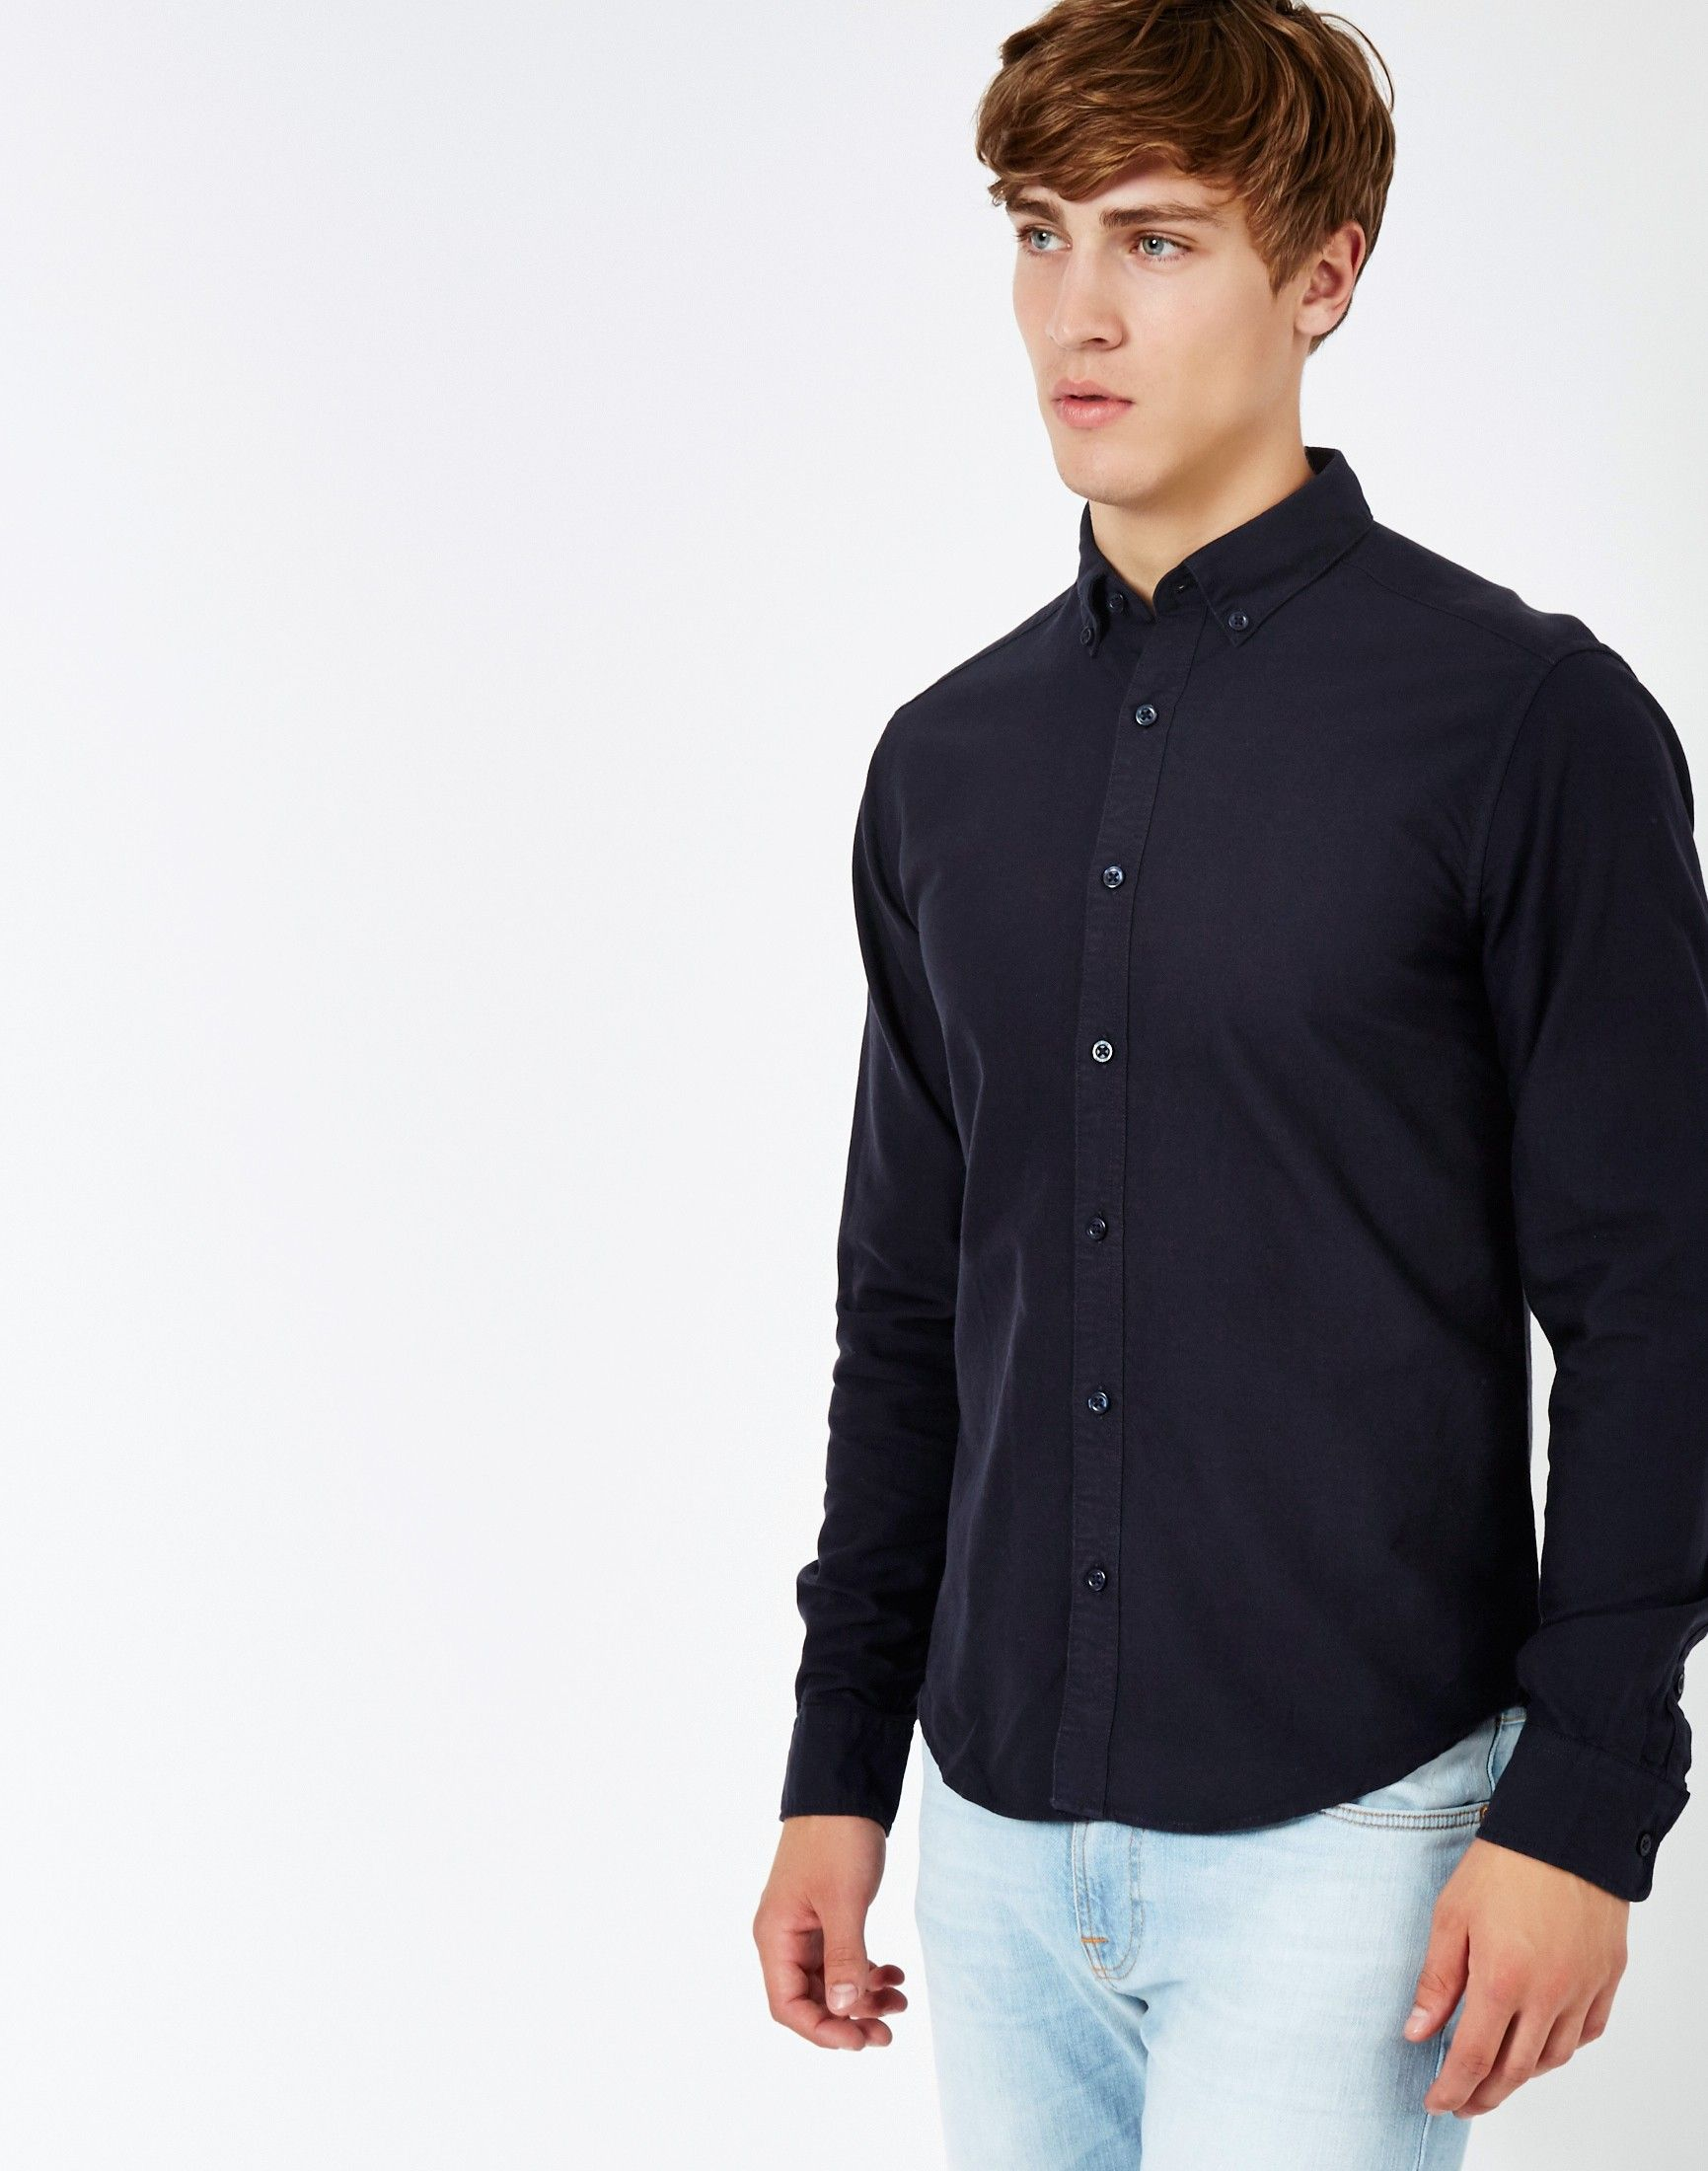 Only & Sons Sebastian Oxford Shirt in Navy | Shop all men's shirts ...